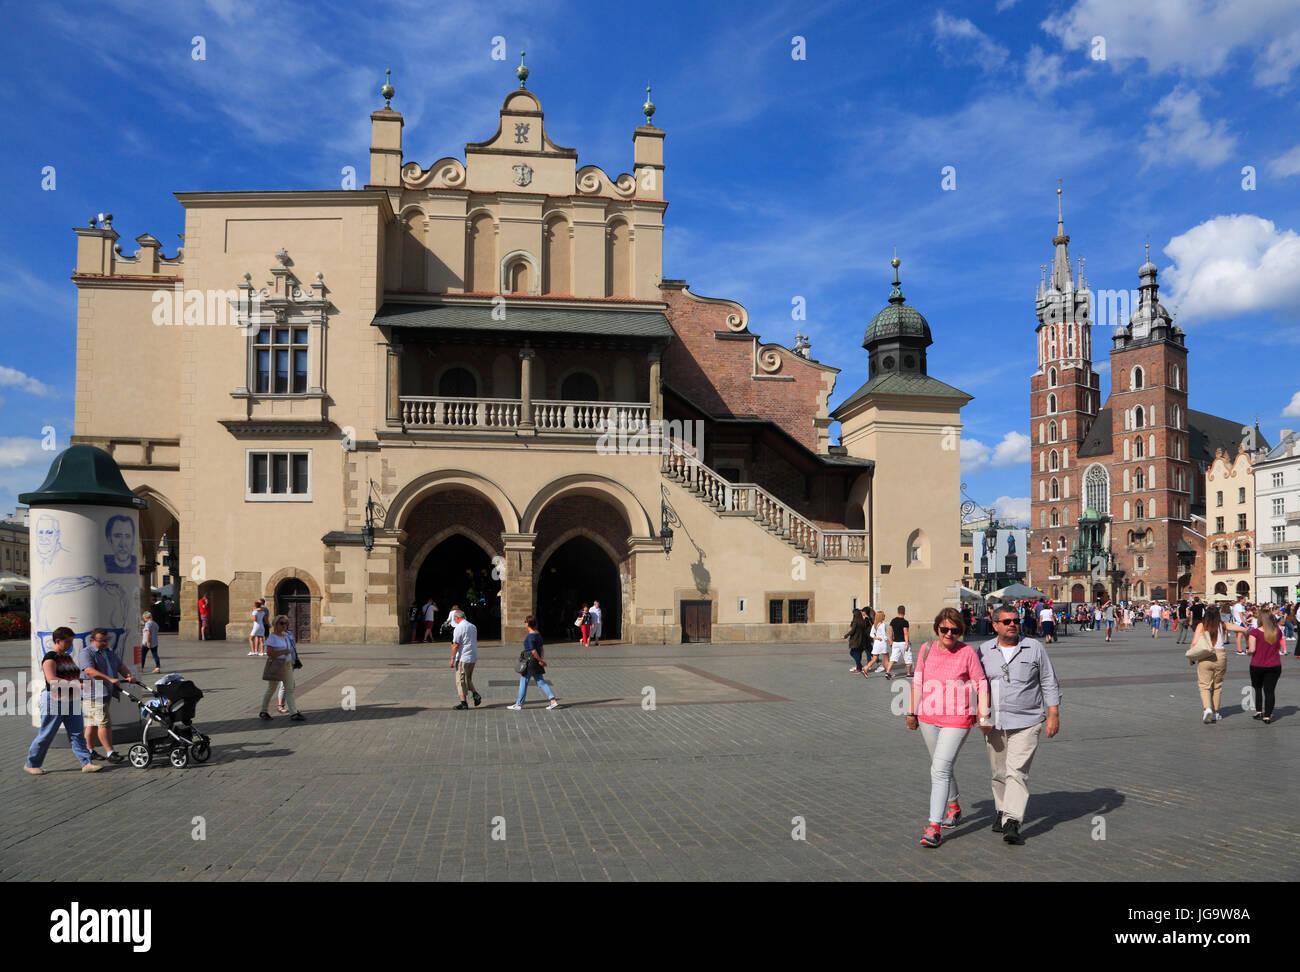 Les salles à tissu Rynek, Cracovie, Pologne, Europe Photo Stock